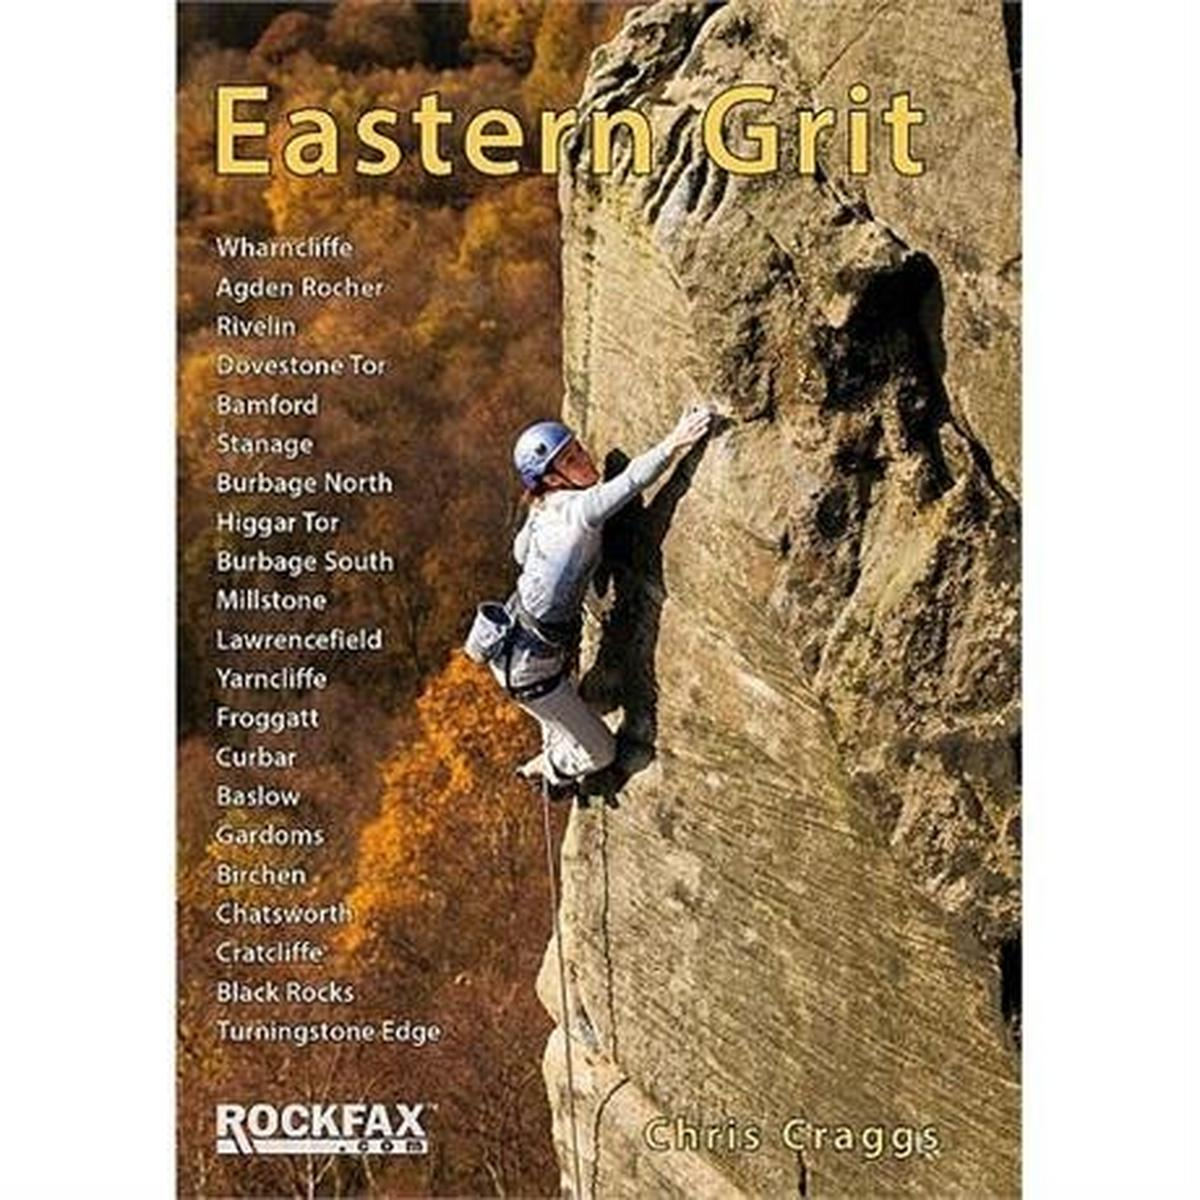 Rockfax Climbing Guide Book: Eastern Grit